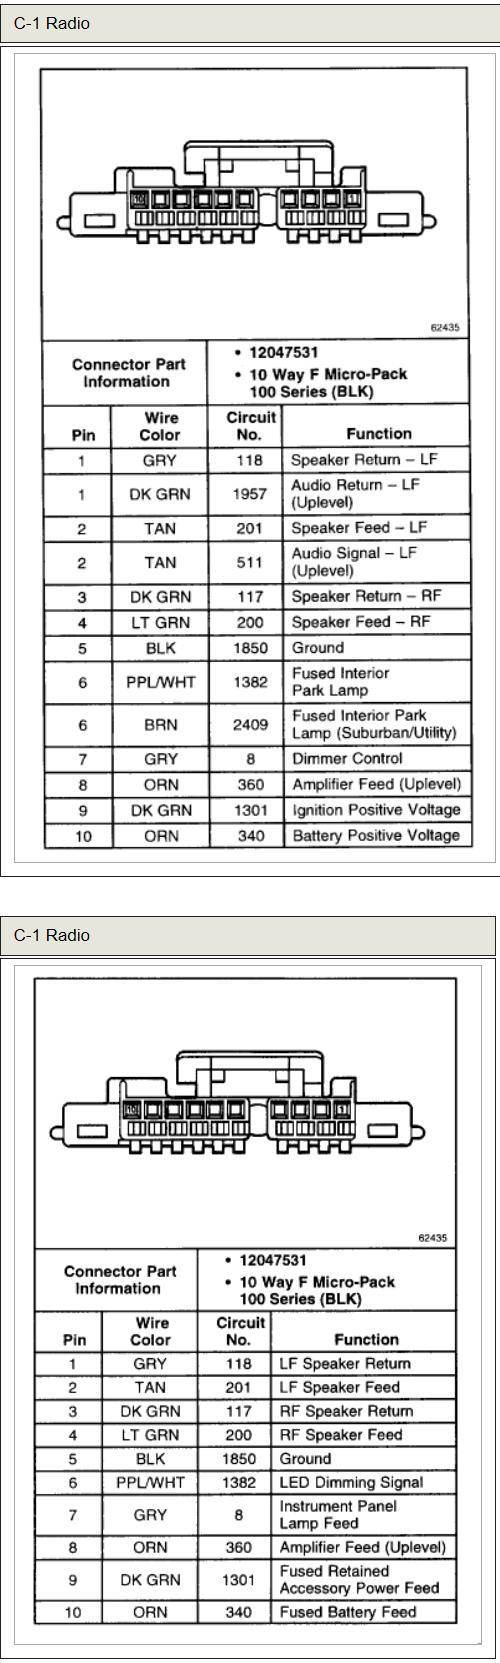 Chevrolet Car Radio Stereo Audio Wiring Diagram Autoradio Connector - Chevy Radio Wiring Diagram